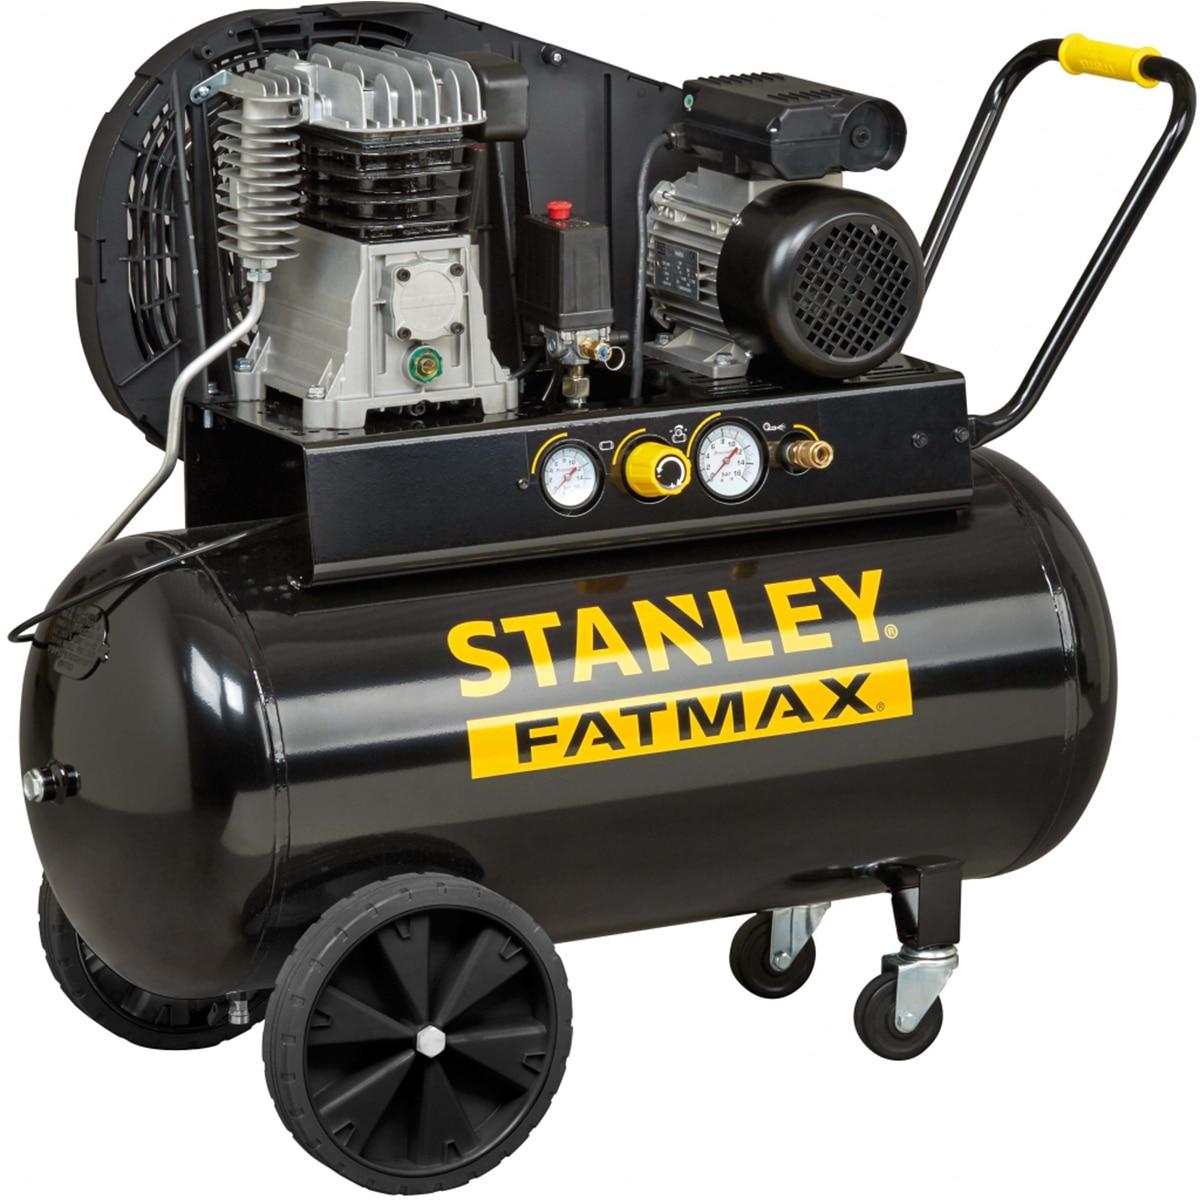 Fotografie Compresor de aer profesional Stanley FatMax, 100l, 3CP, 10 bar, 330l/m, transmisie curea